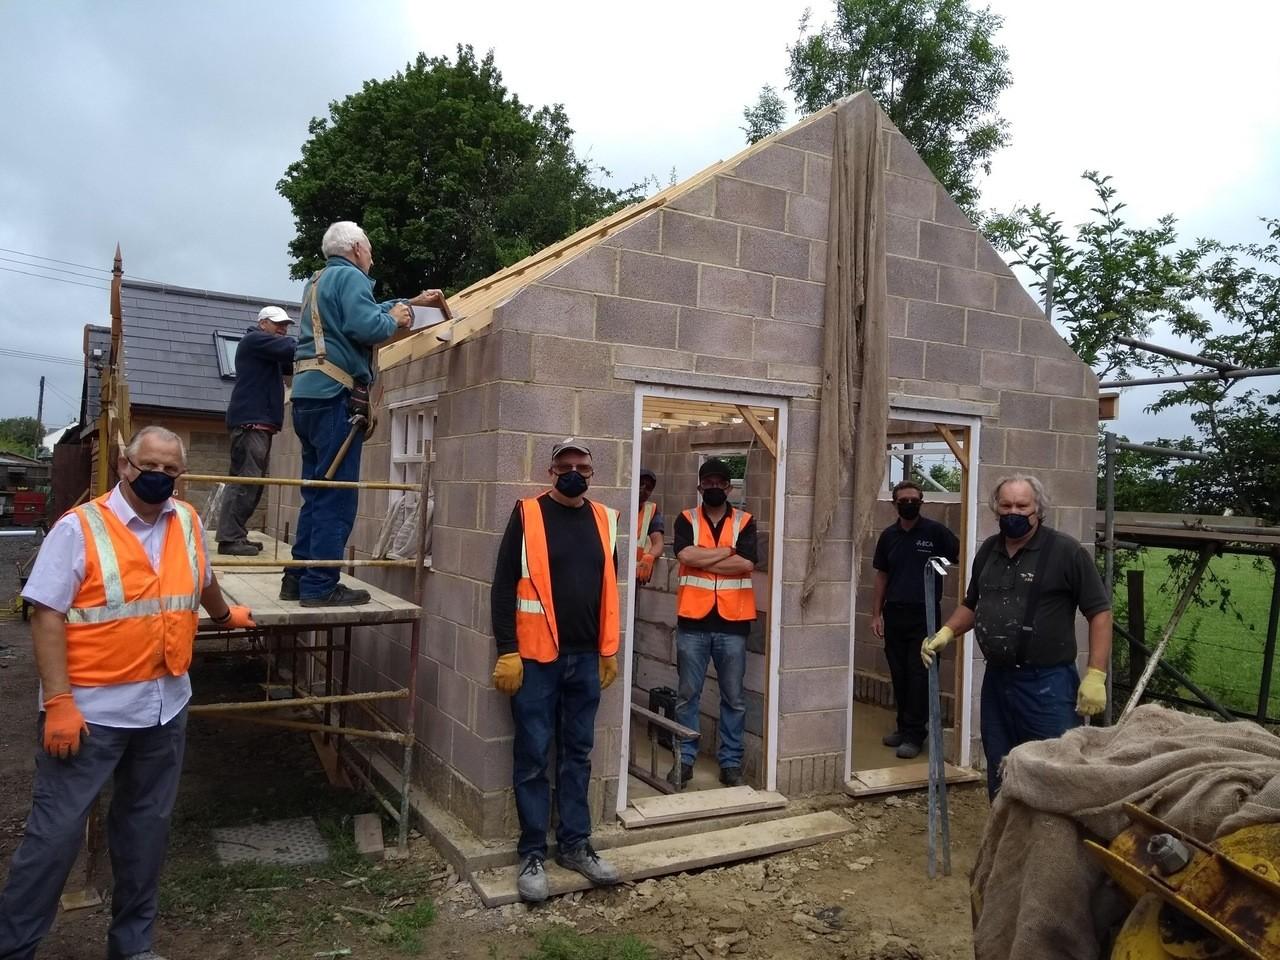 Swindon and Cricklade Railway donation | Asda Swindon Haydon